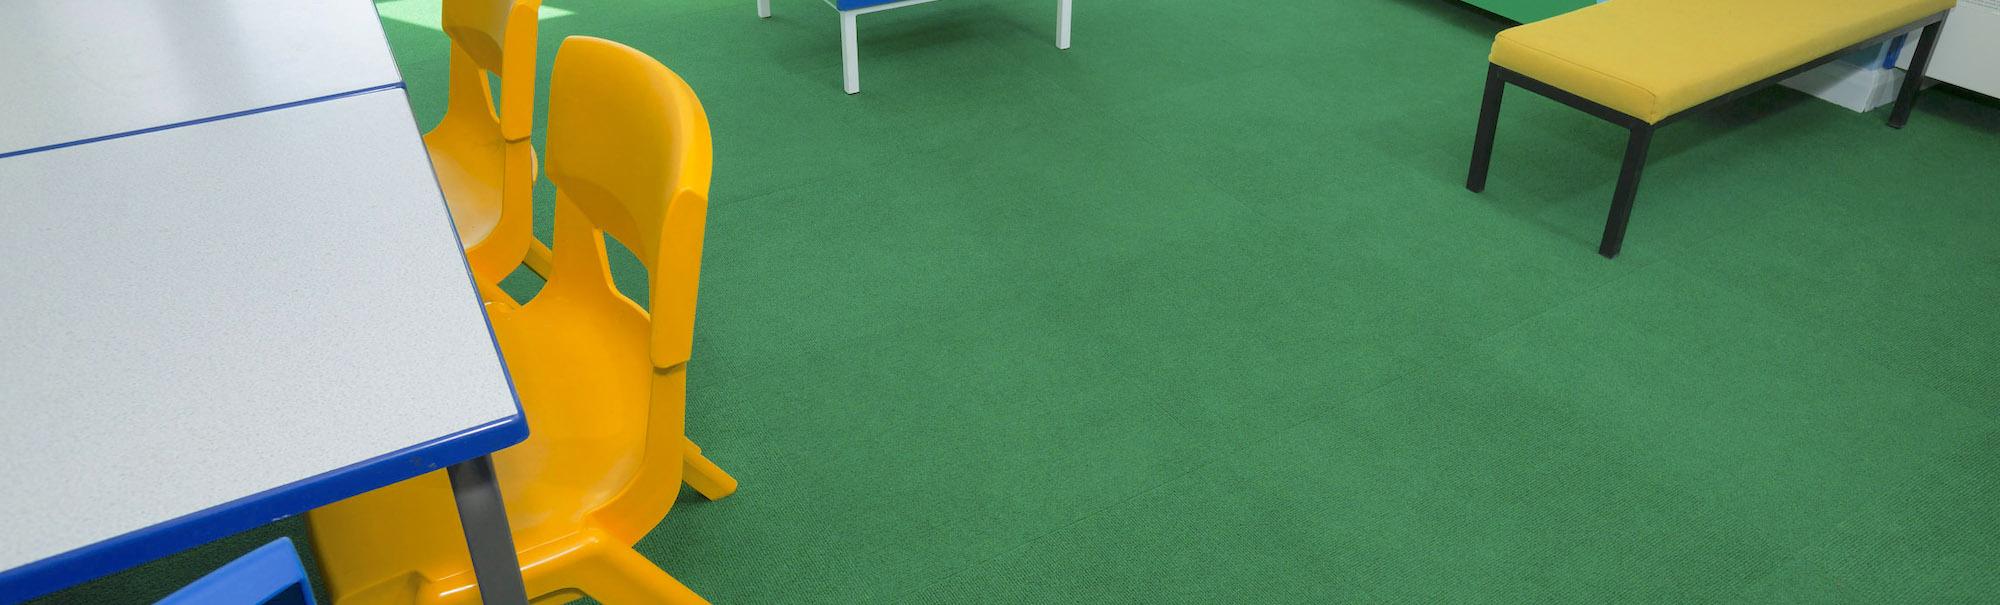 Heckmondwike | Commercial Carpet and Carpet Tiles | Supacord (2)